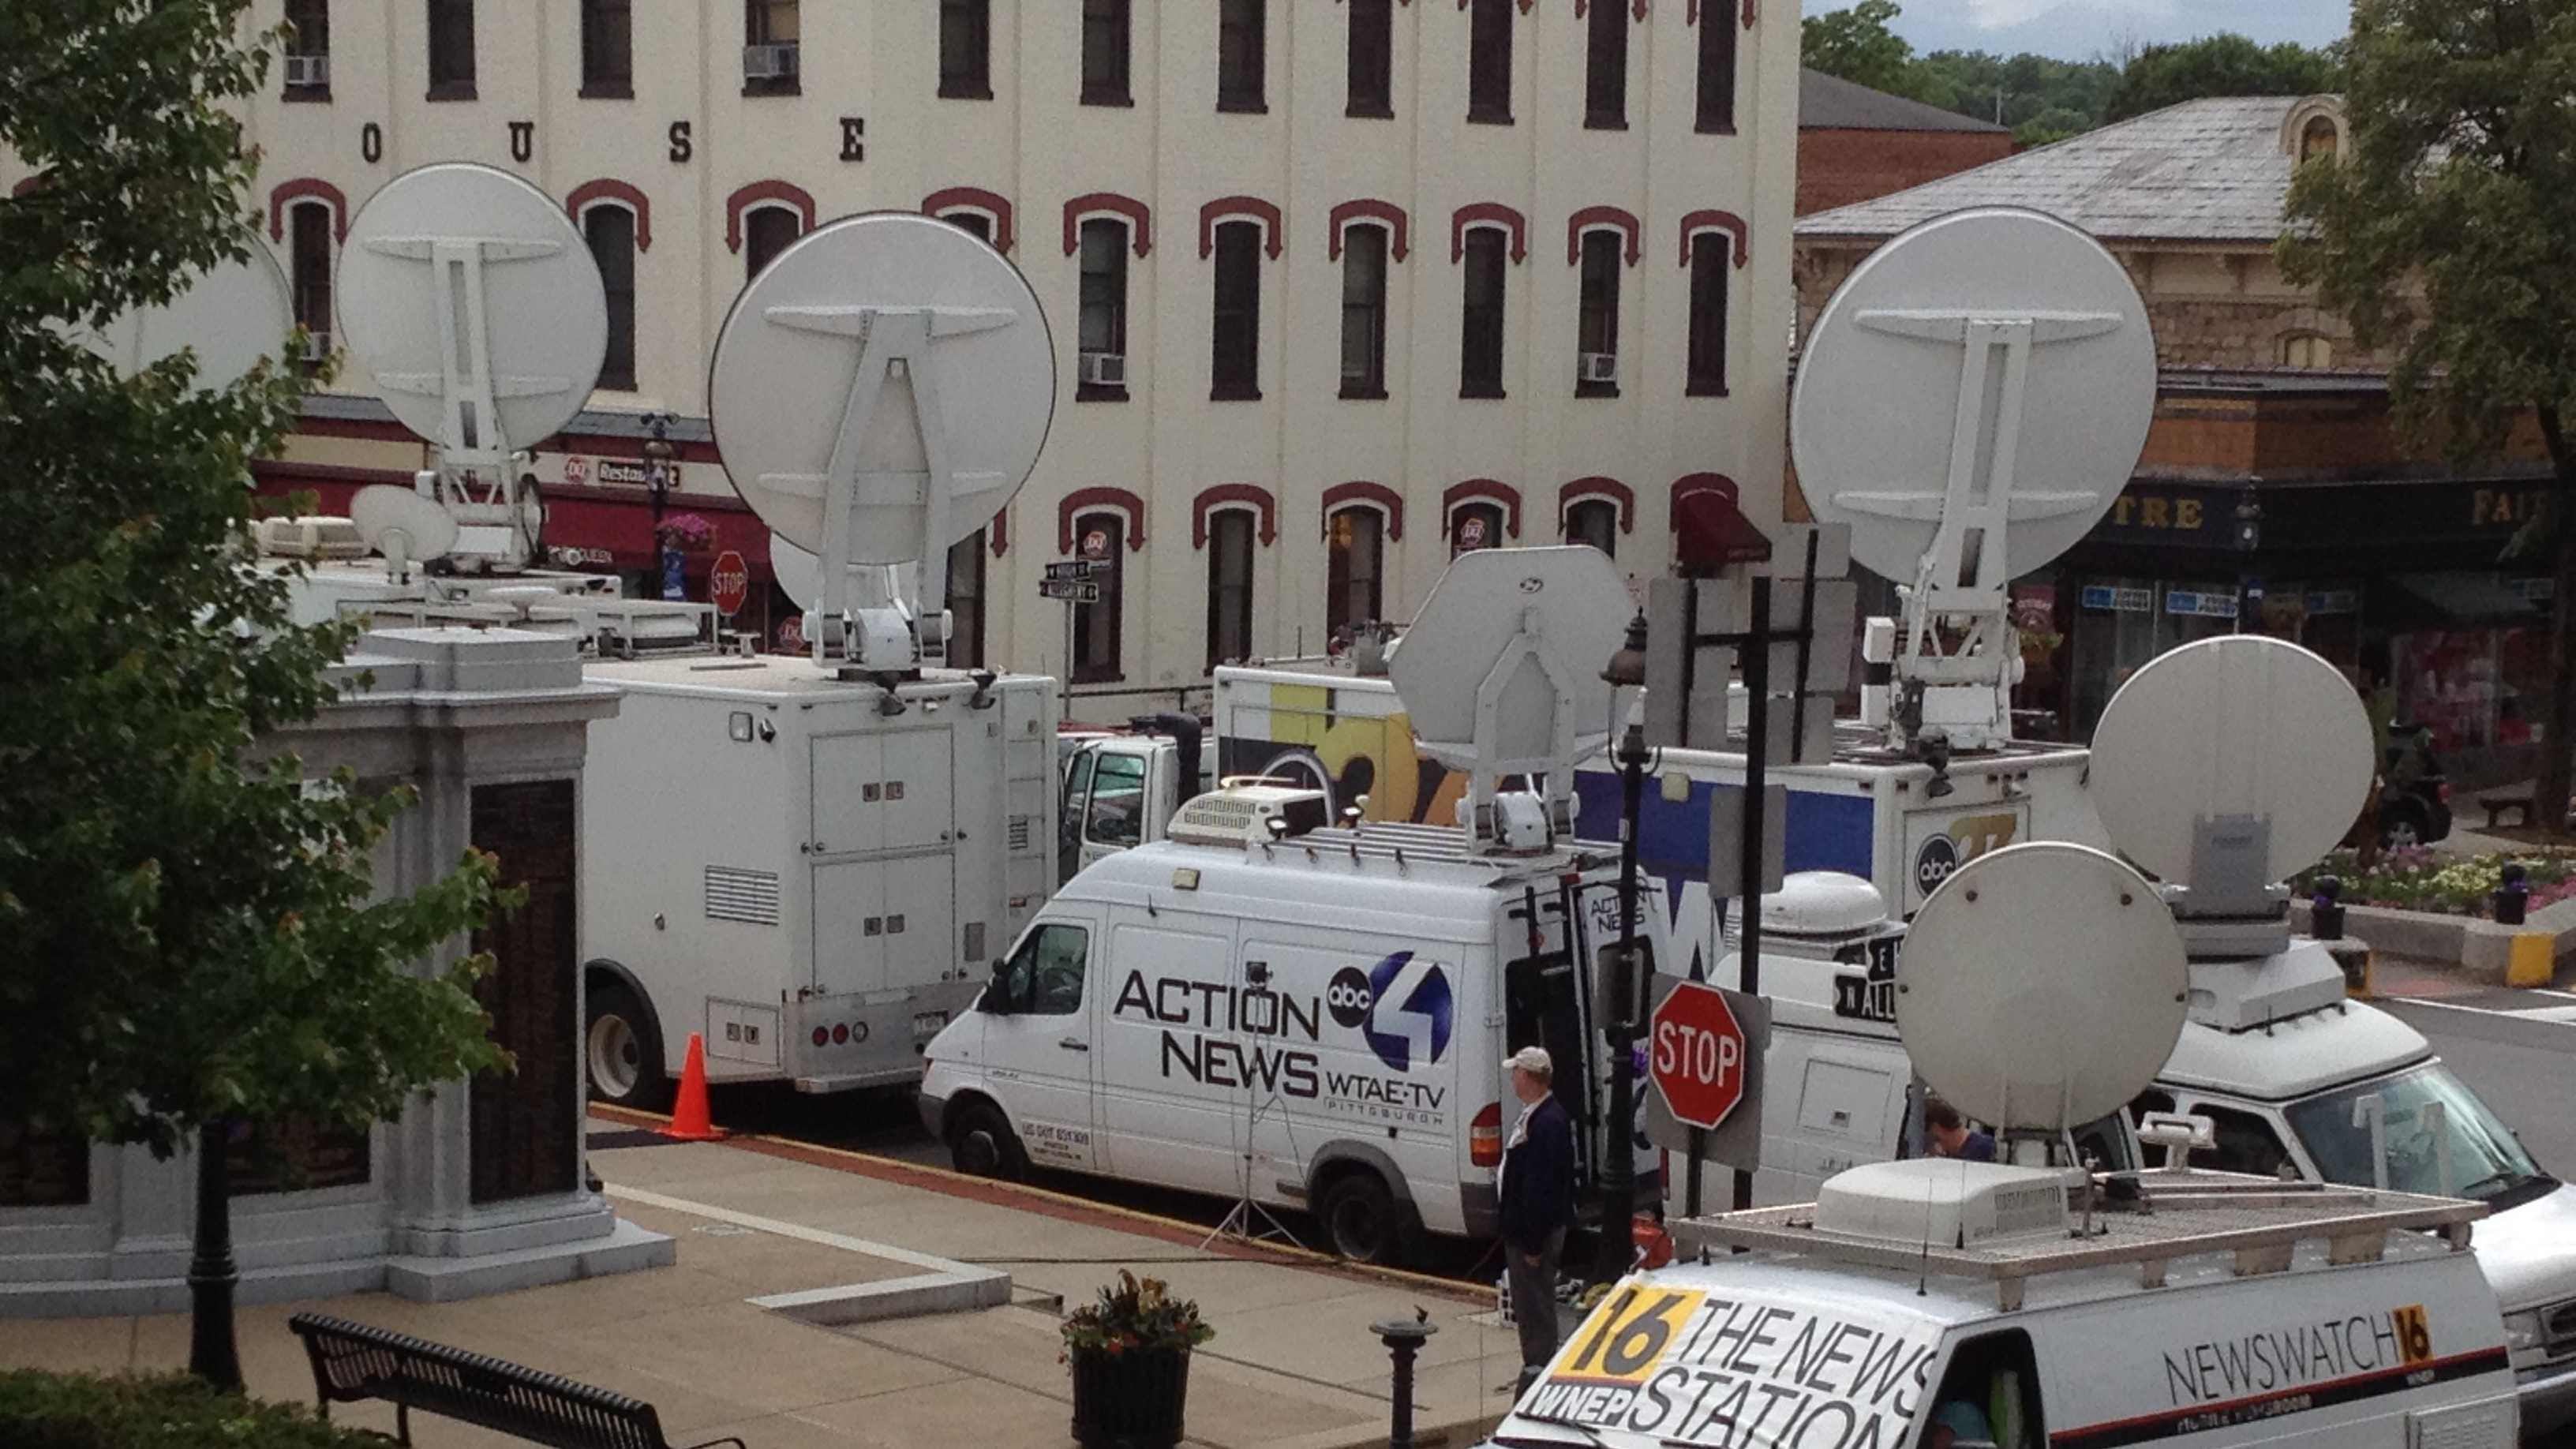 TV news trucks